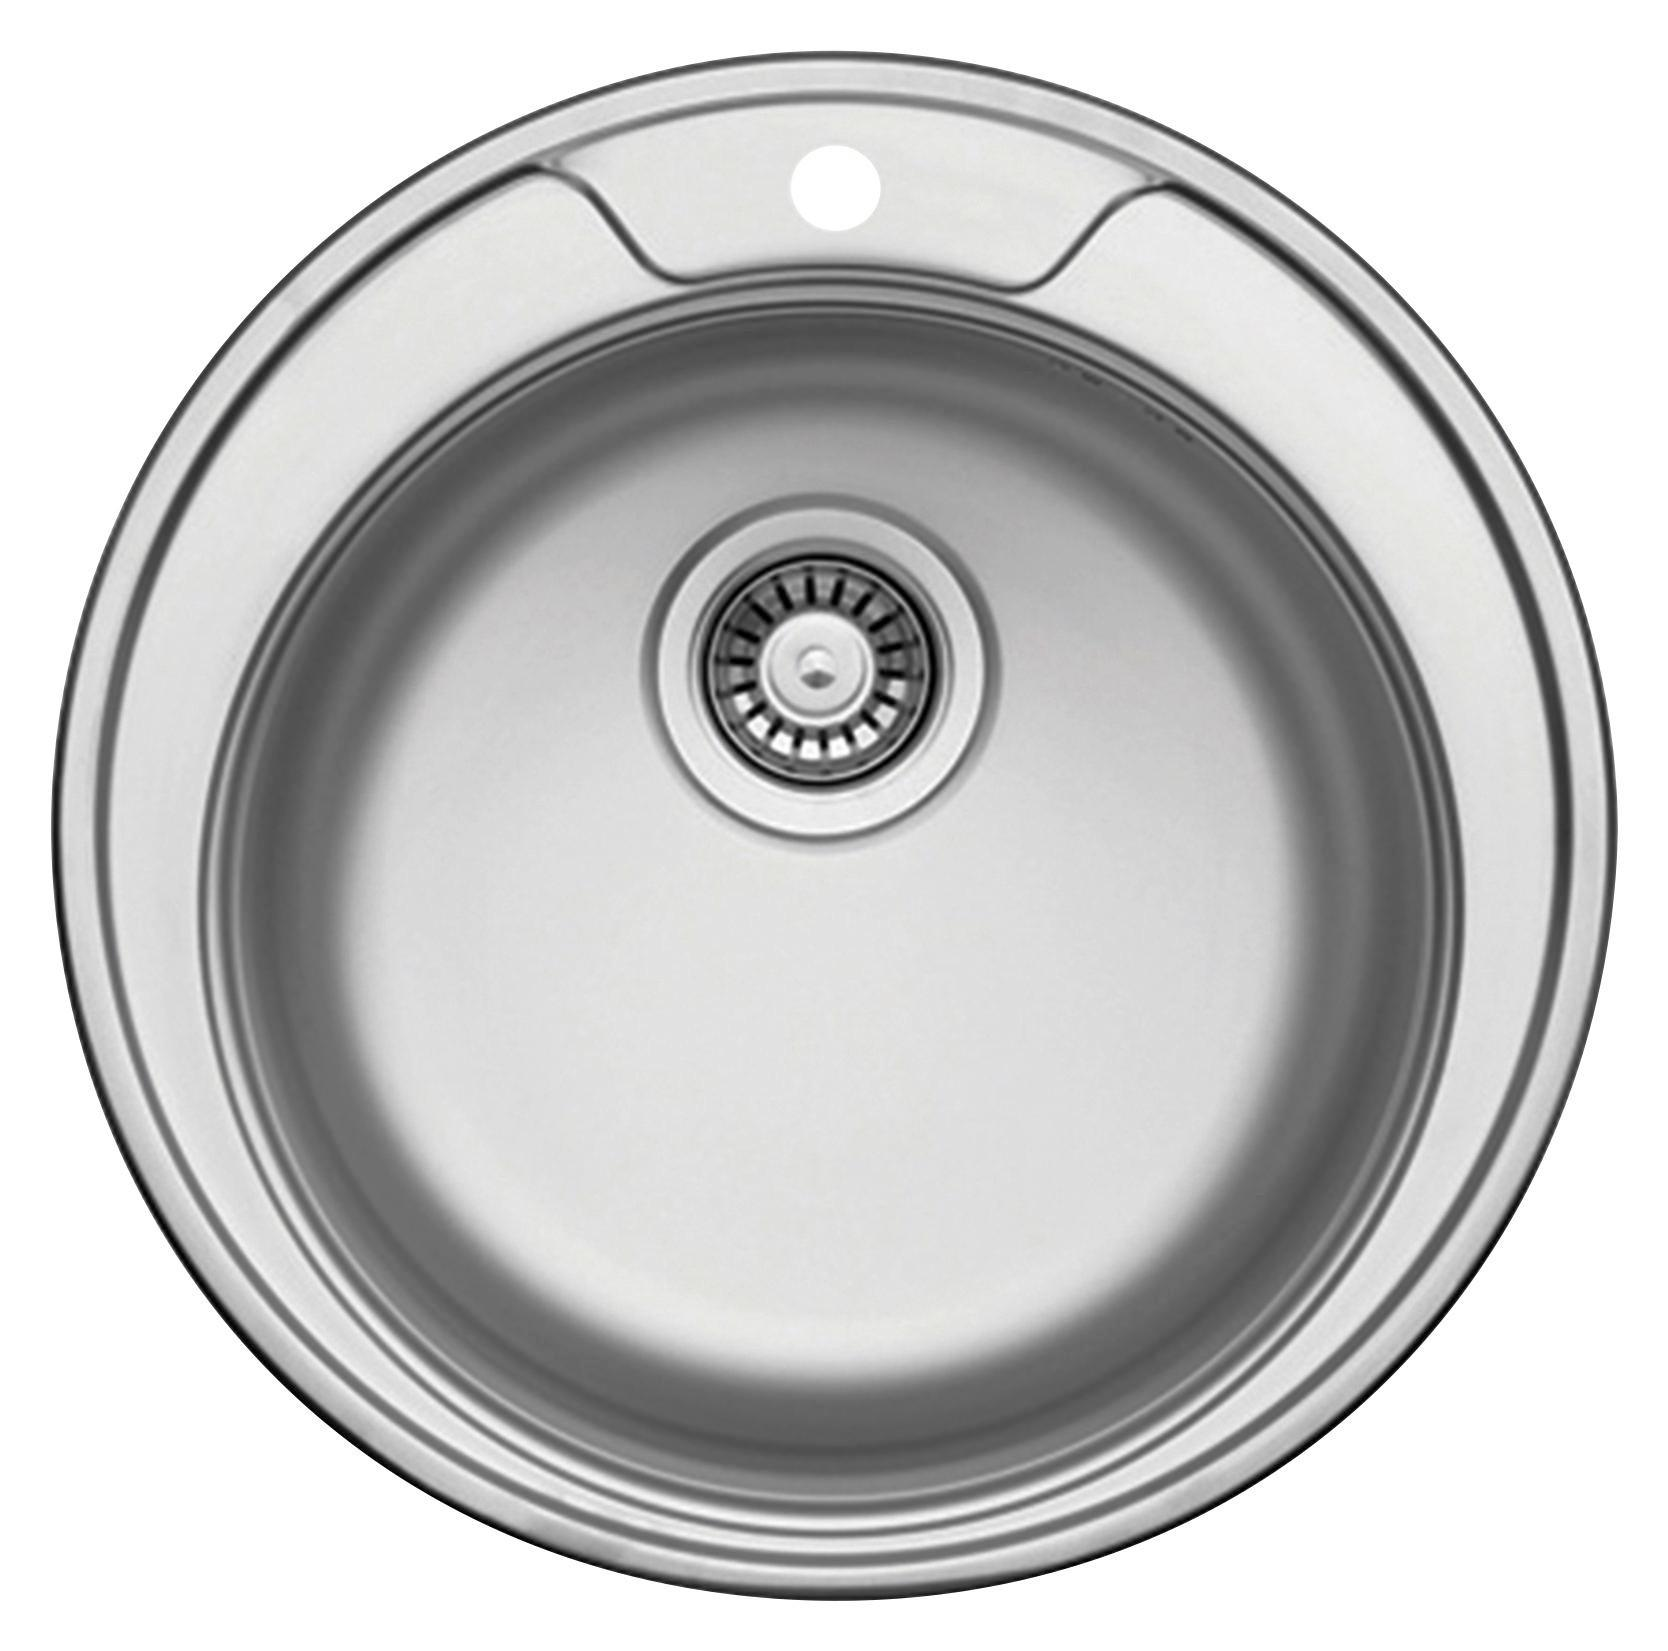 Spülbecken rund edelstahl matt  Küchenspülen entdecken | mömax